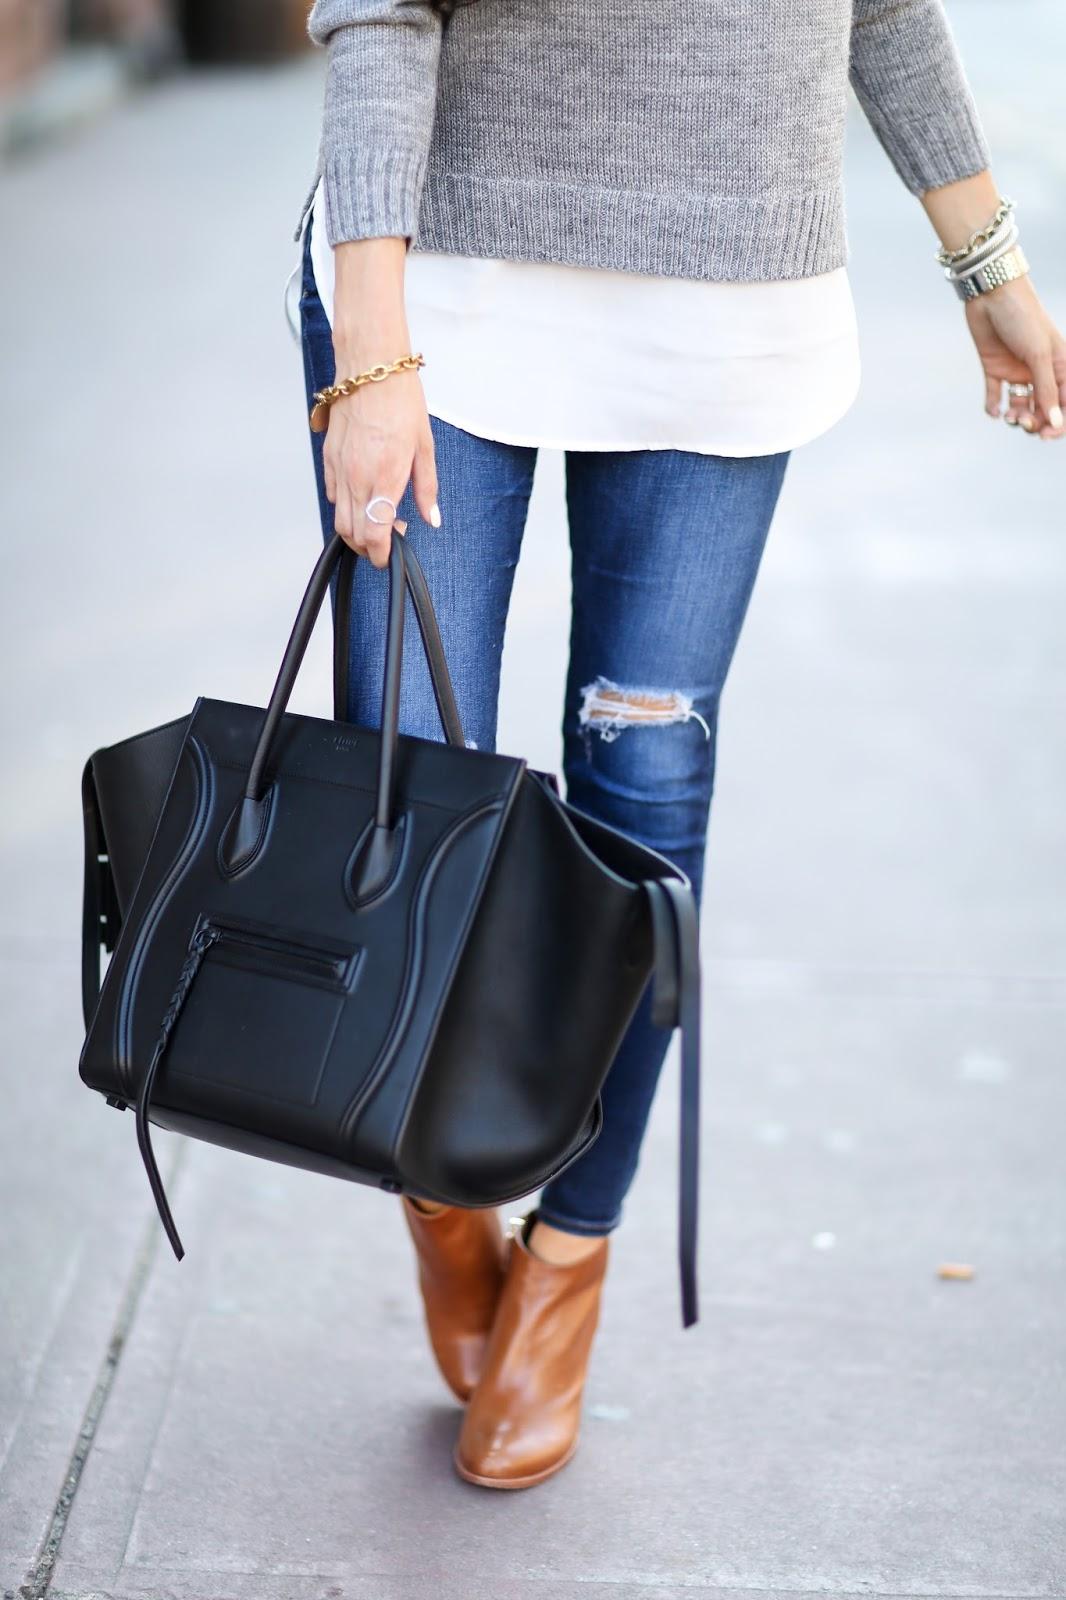 Celine Bags Nordstrom